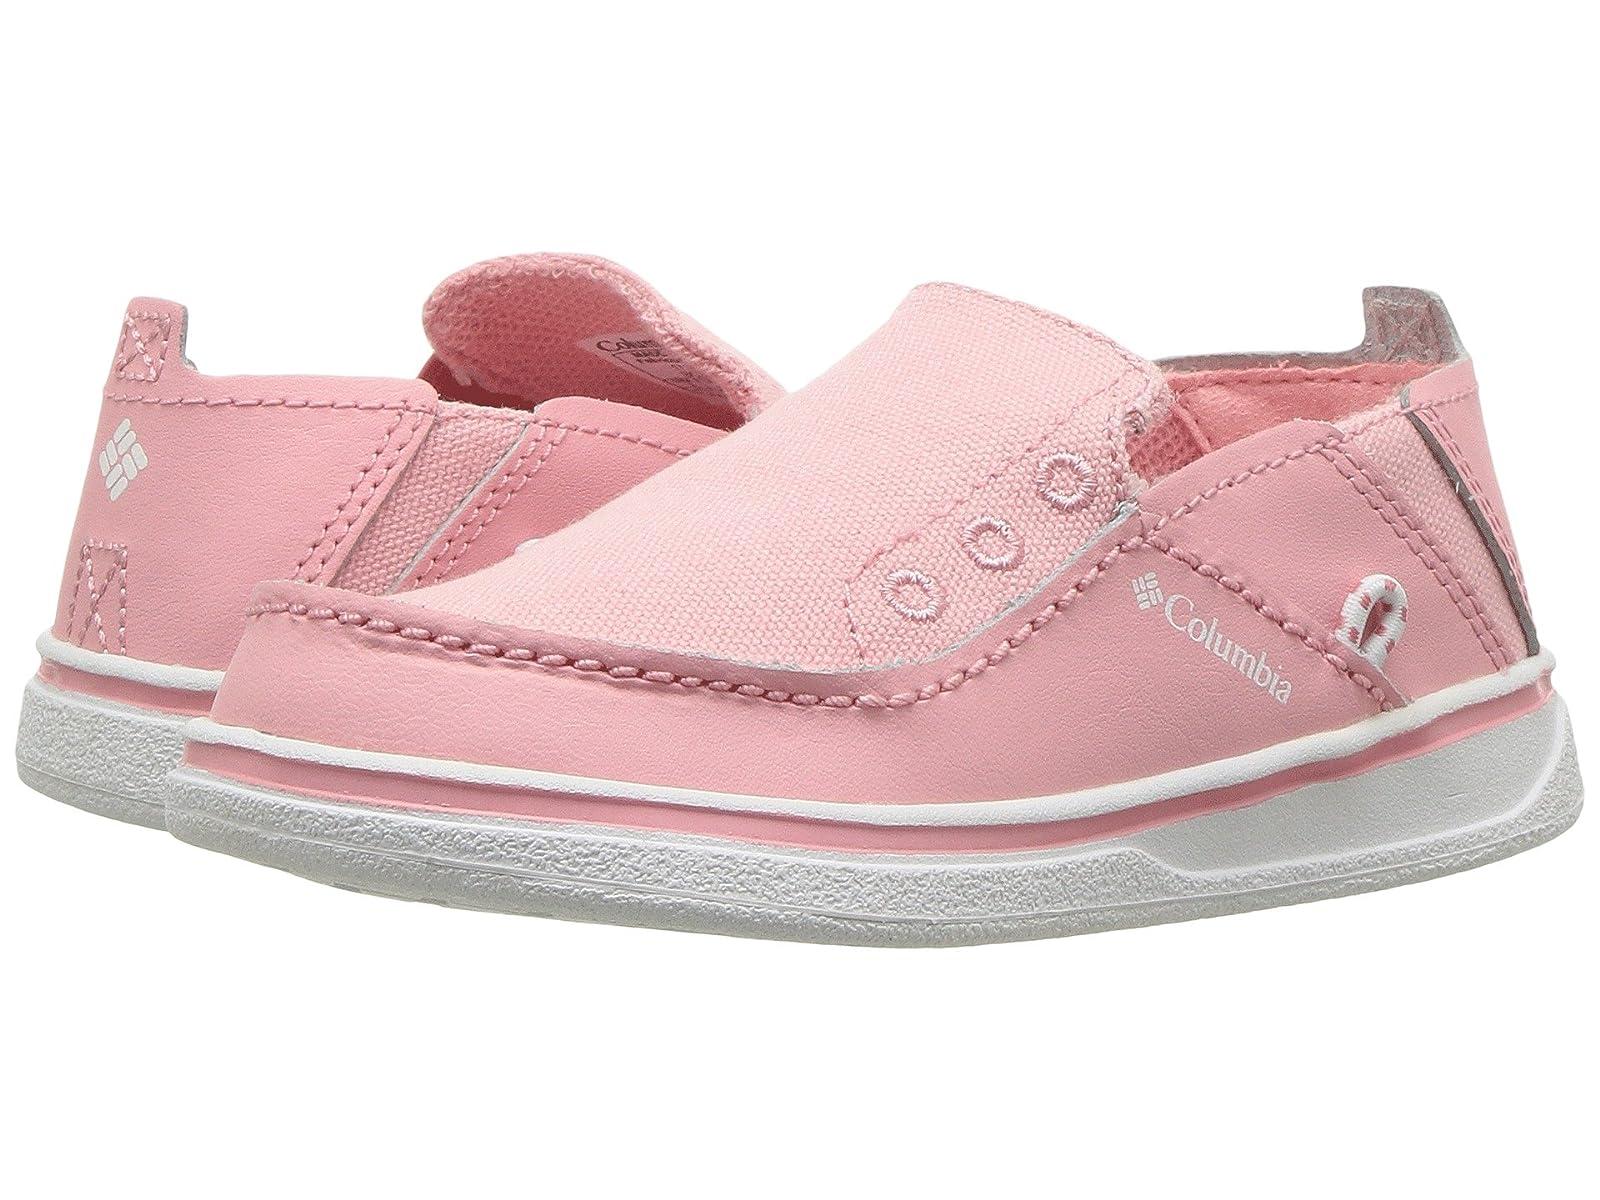 Columbia Kids Bahama (Toddler/Little Kid/Big Kid)Selling fashionable and eye-catching shoes